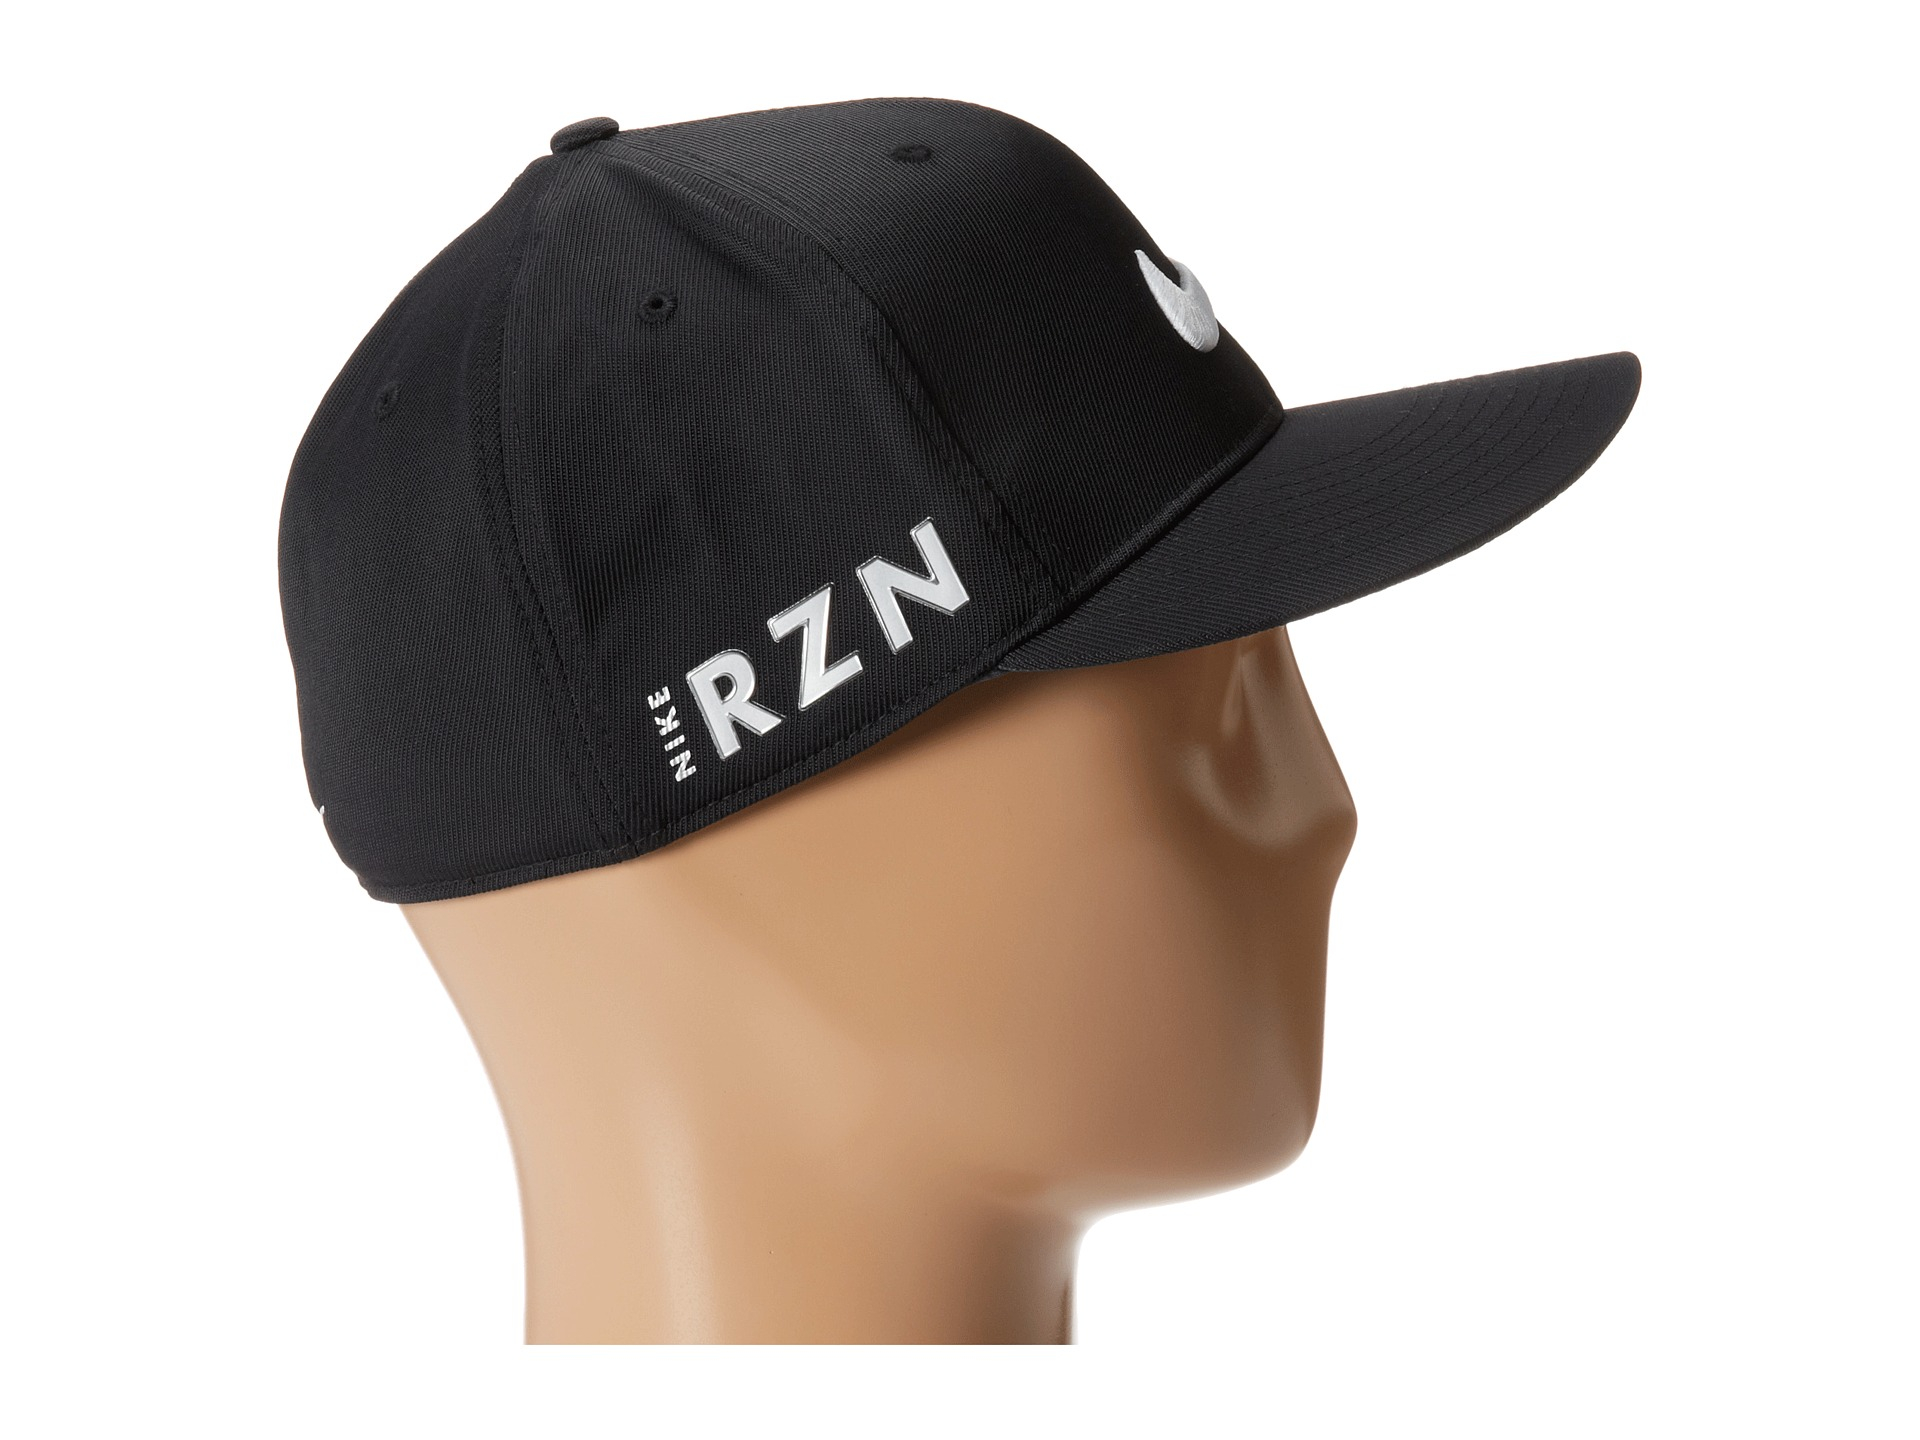 df9b1e518aa2c ... order lyst nike flat bill tour cap in black for men f81c5 32a22